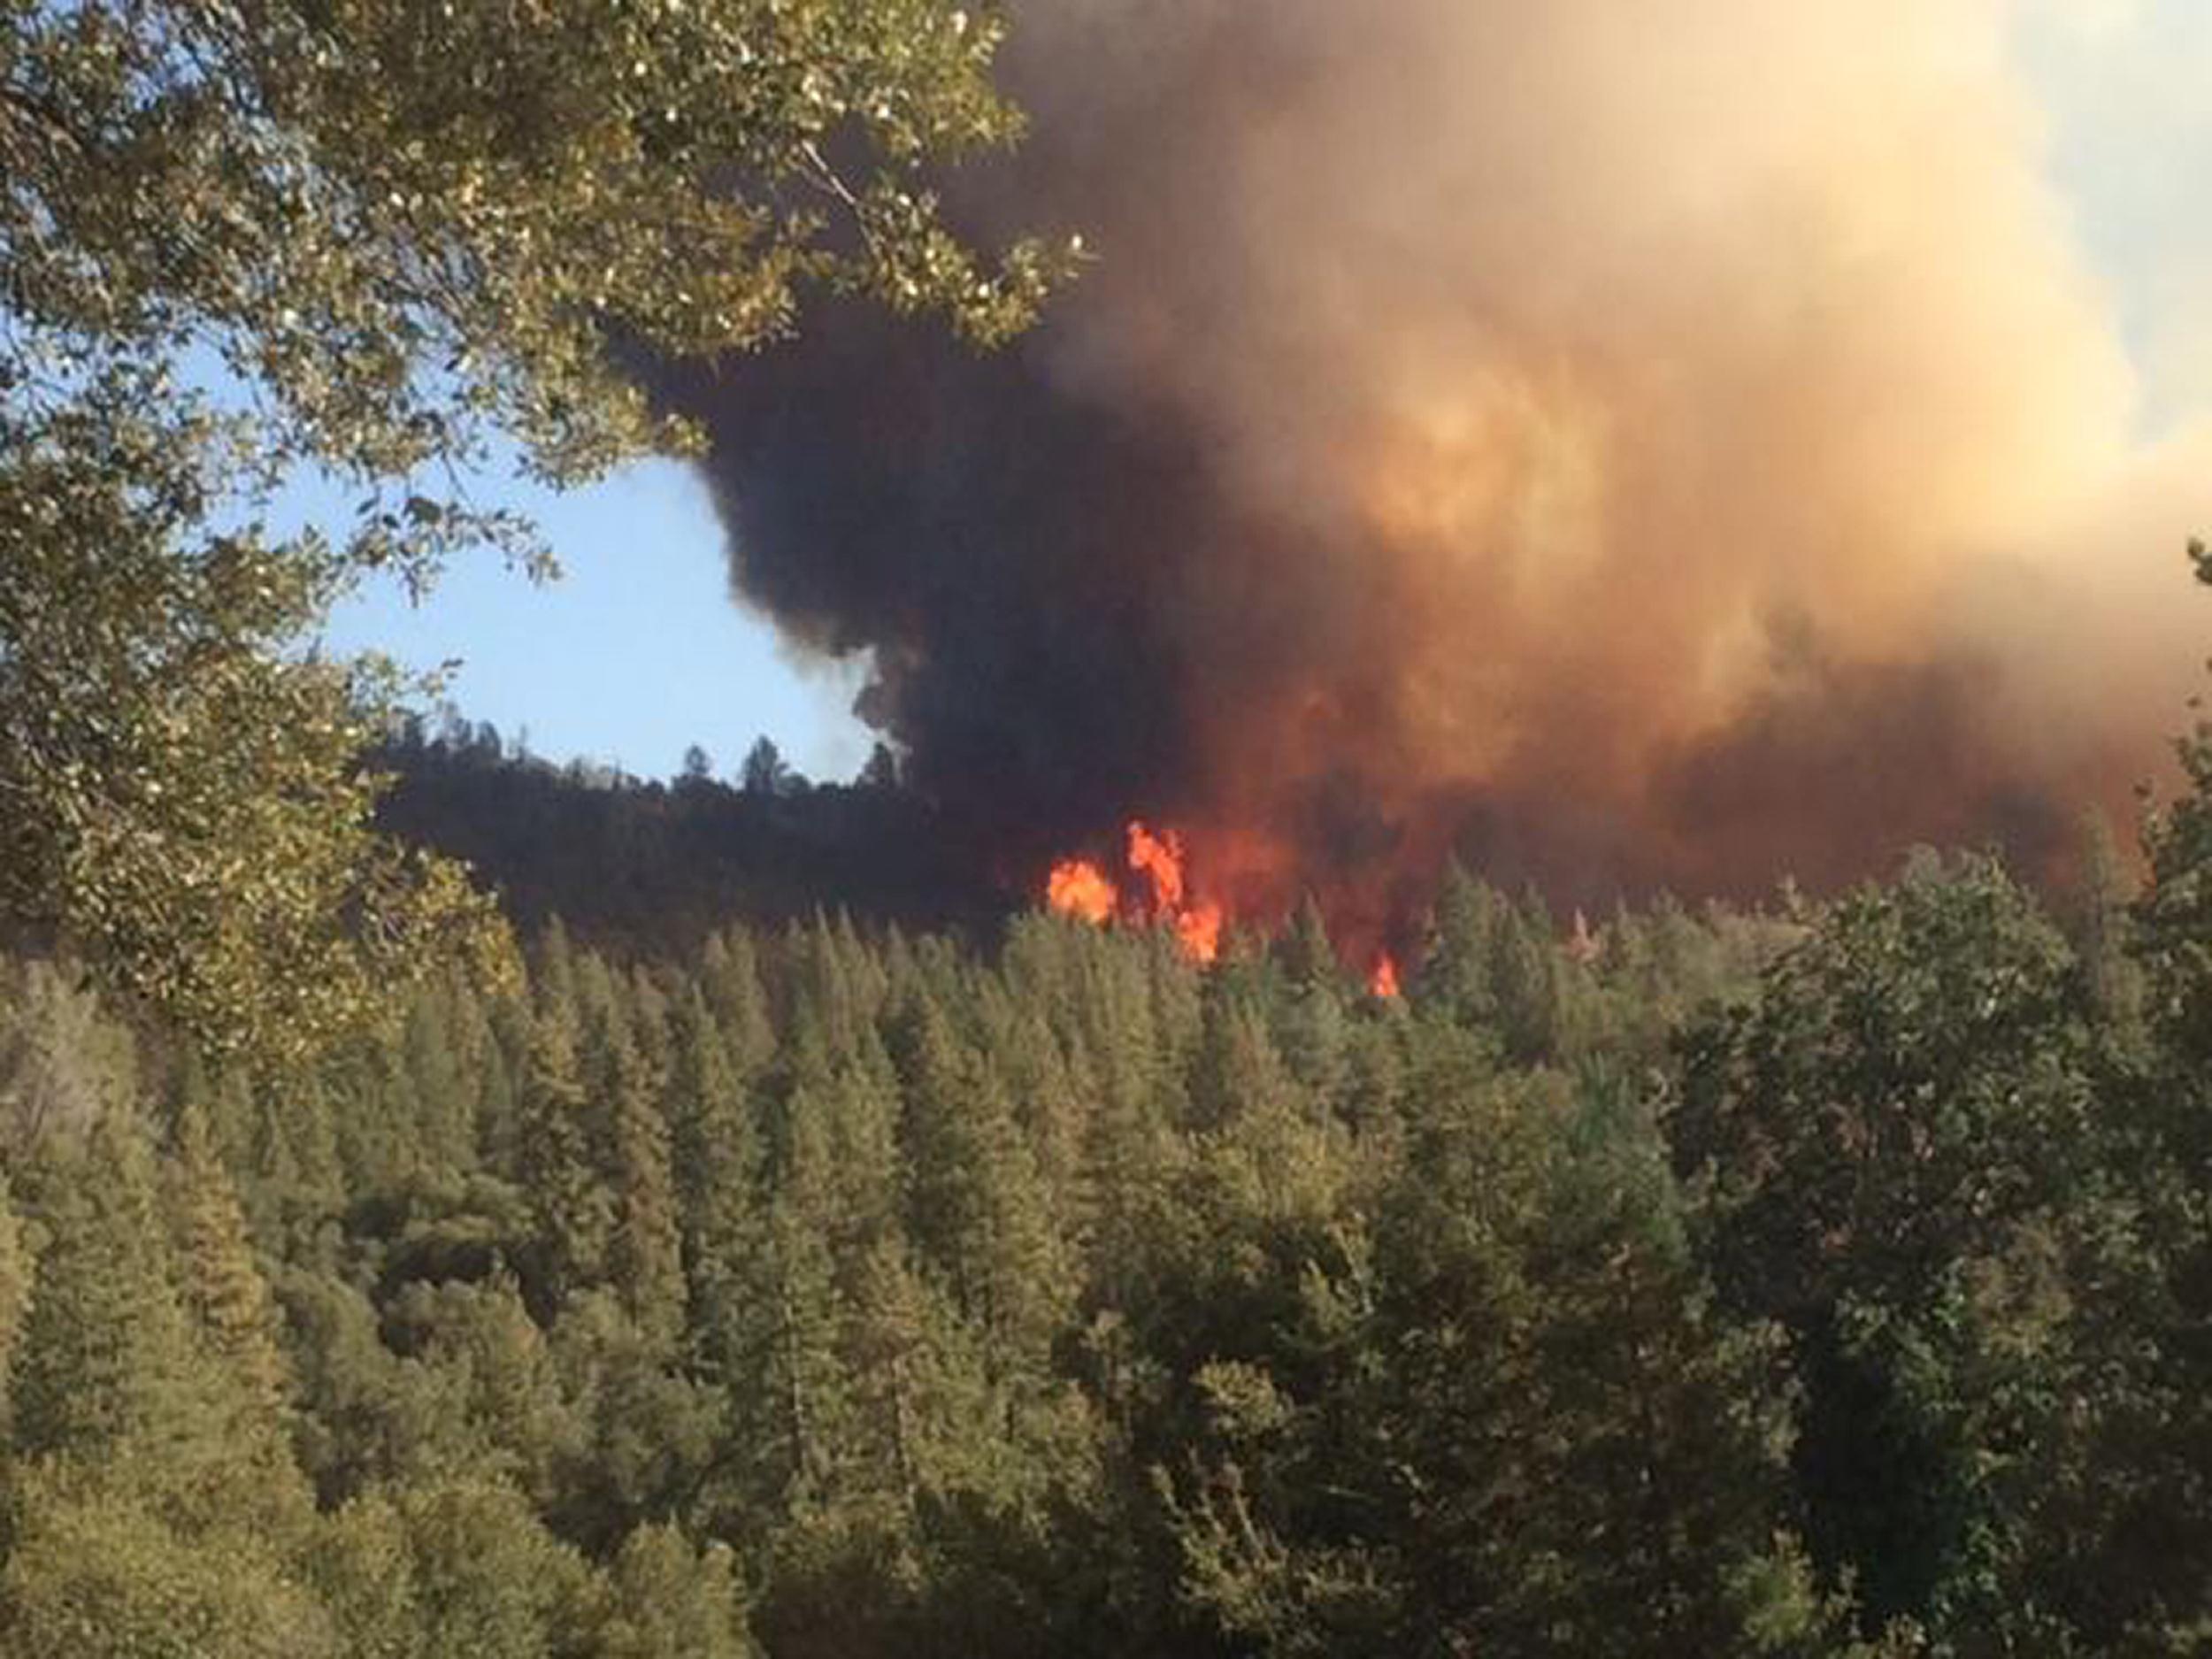 Crews Make Progress Battling Wildfire Near Yosemite